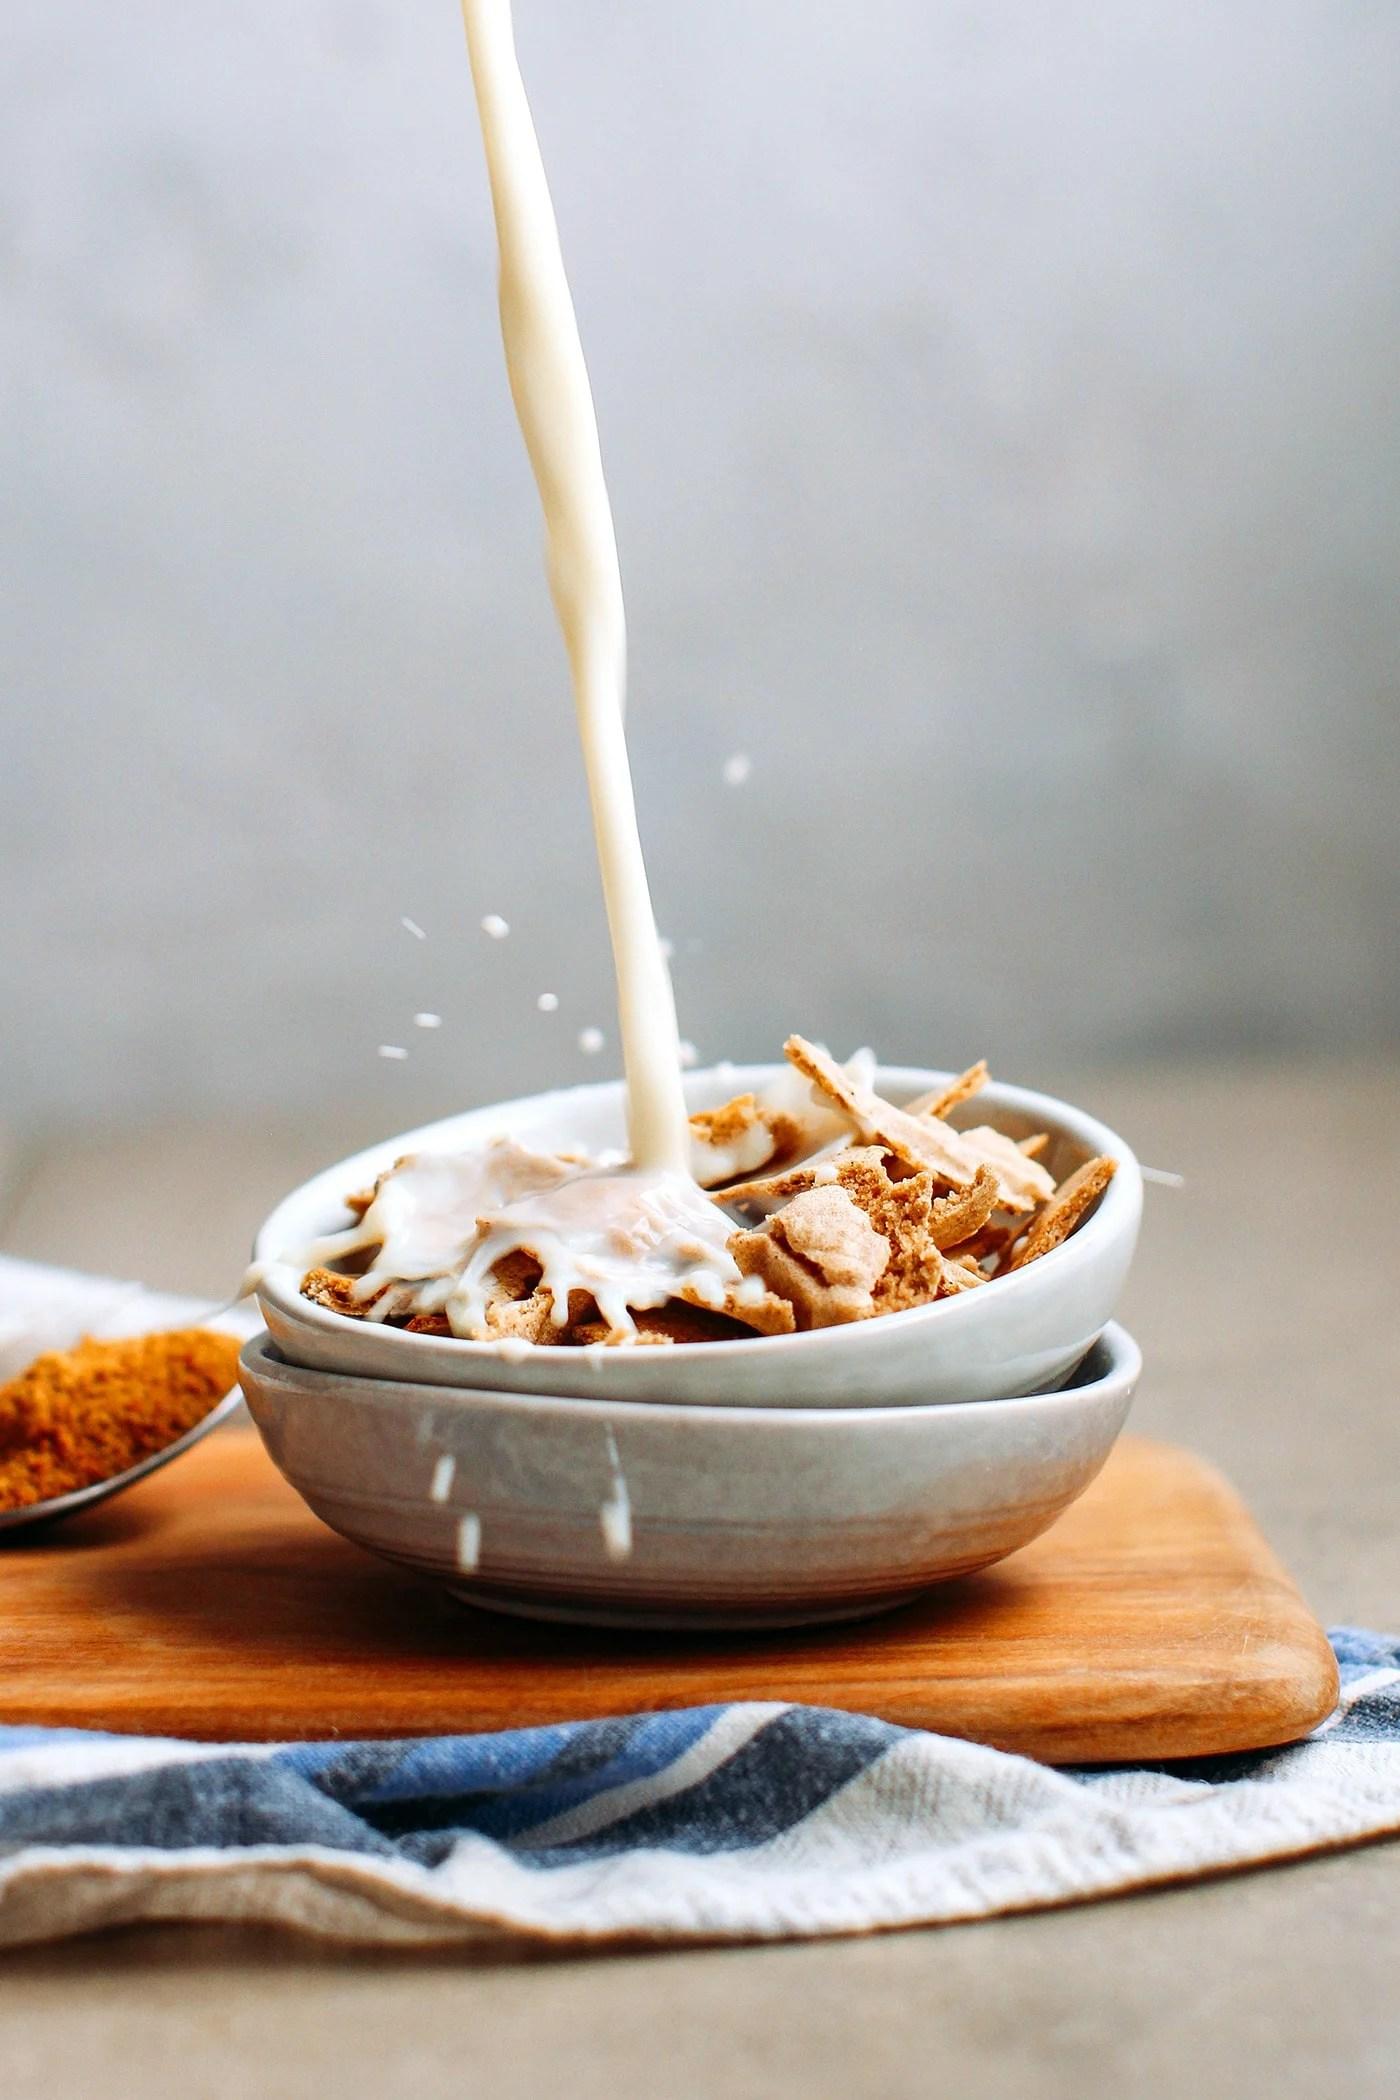 Homemade Buckwheat Flakes